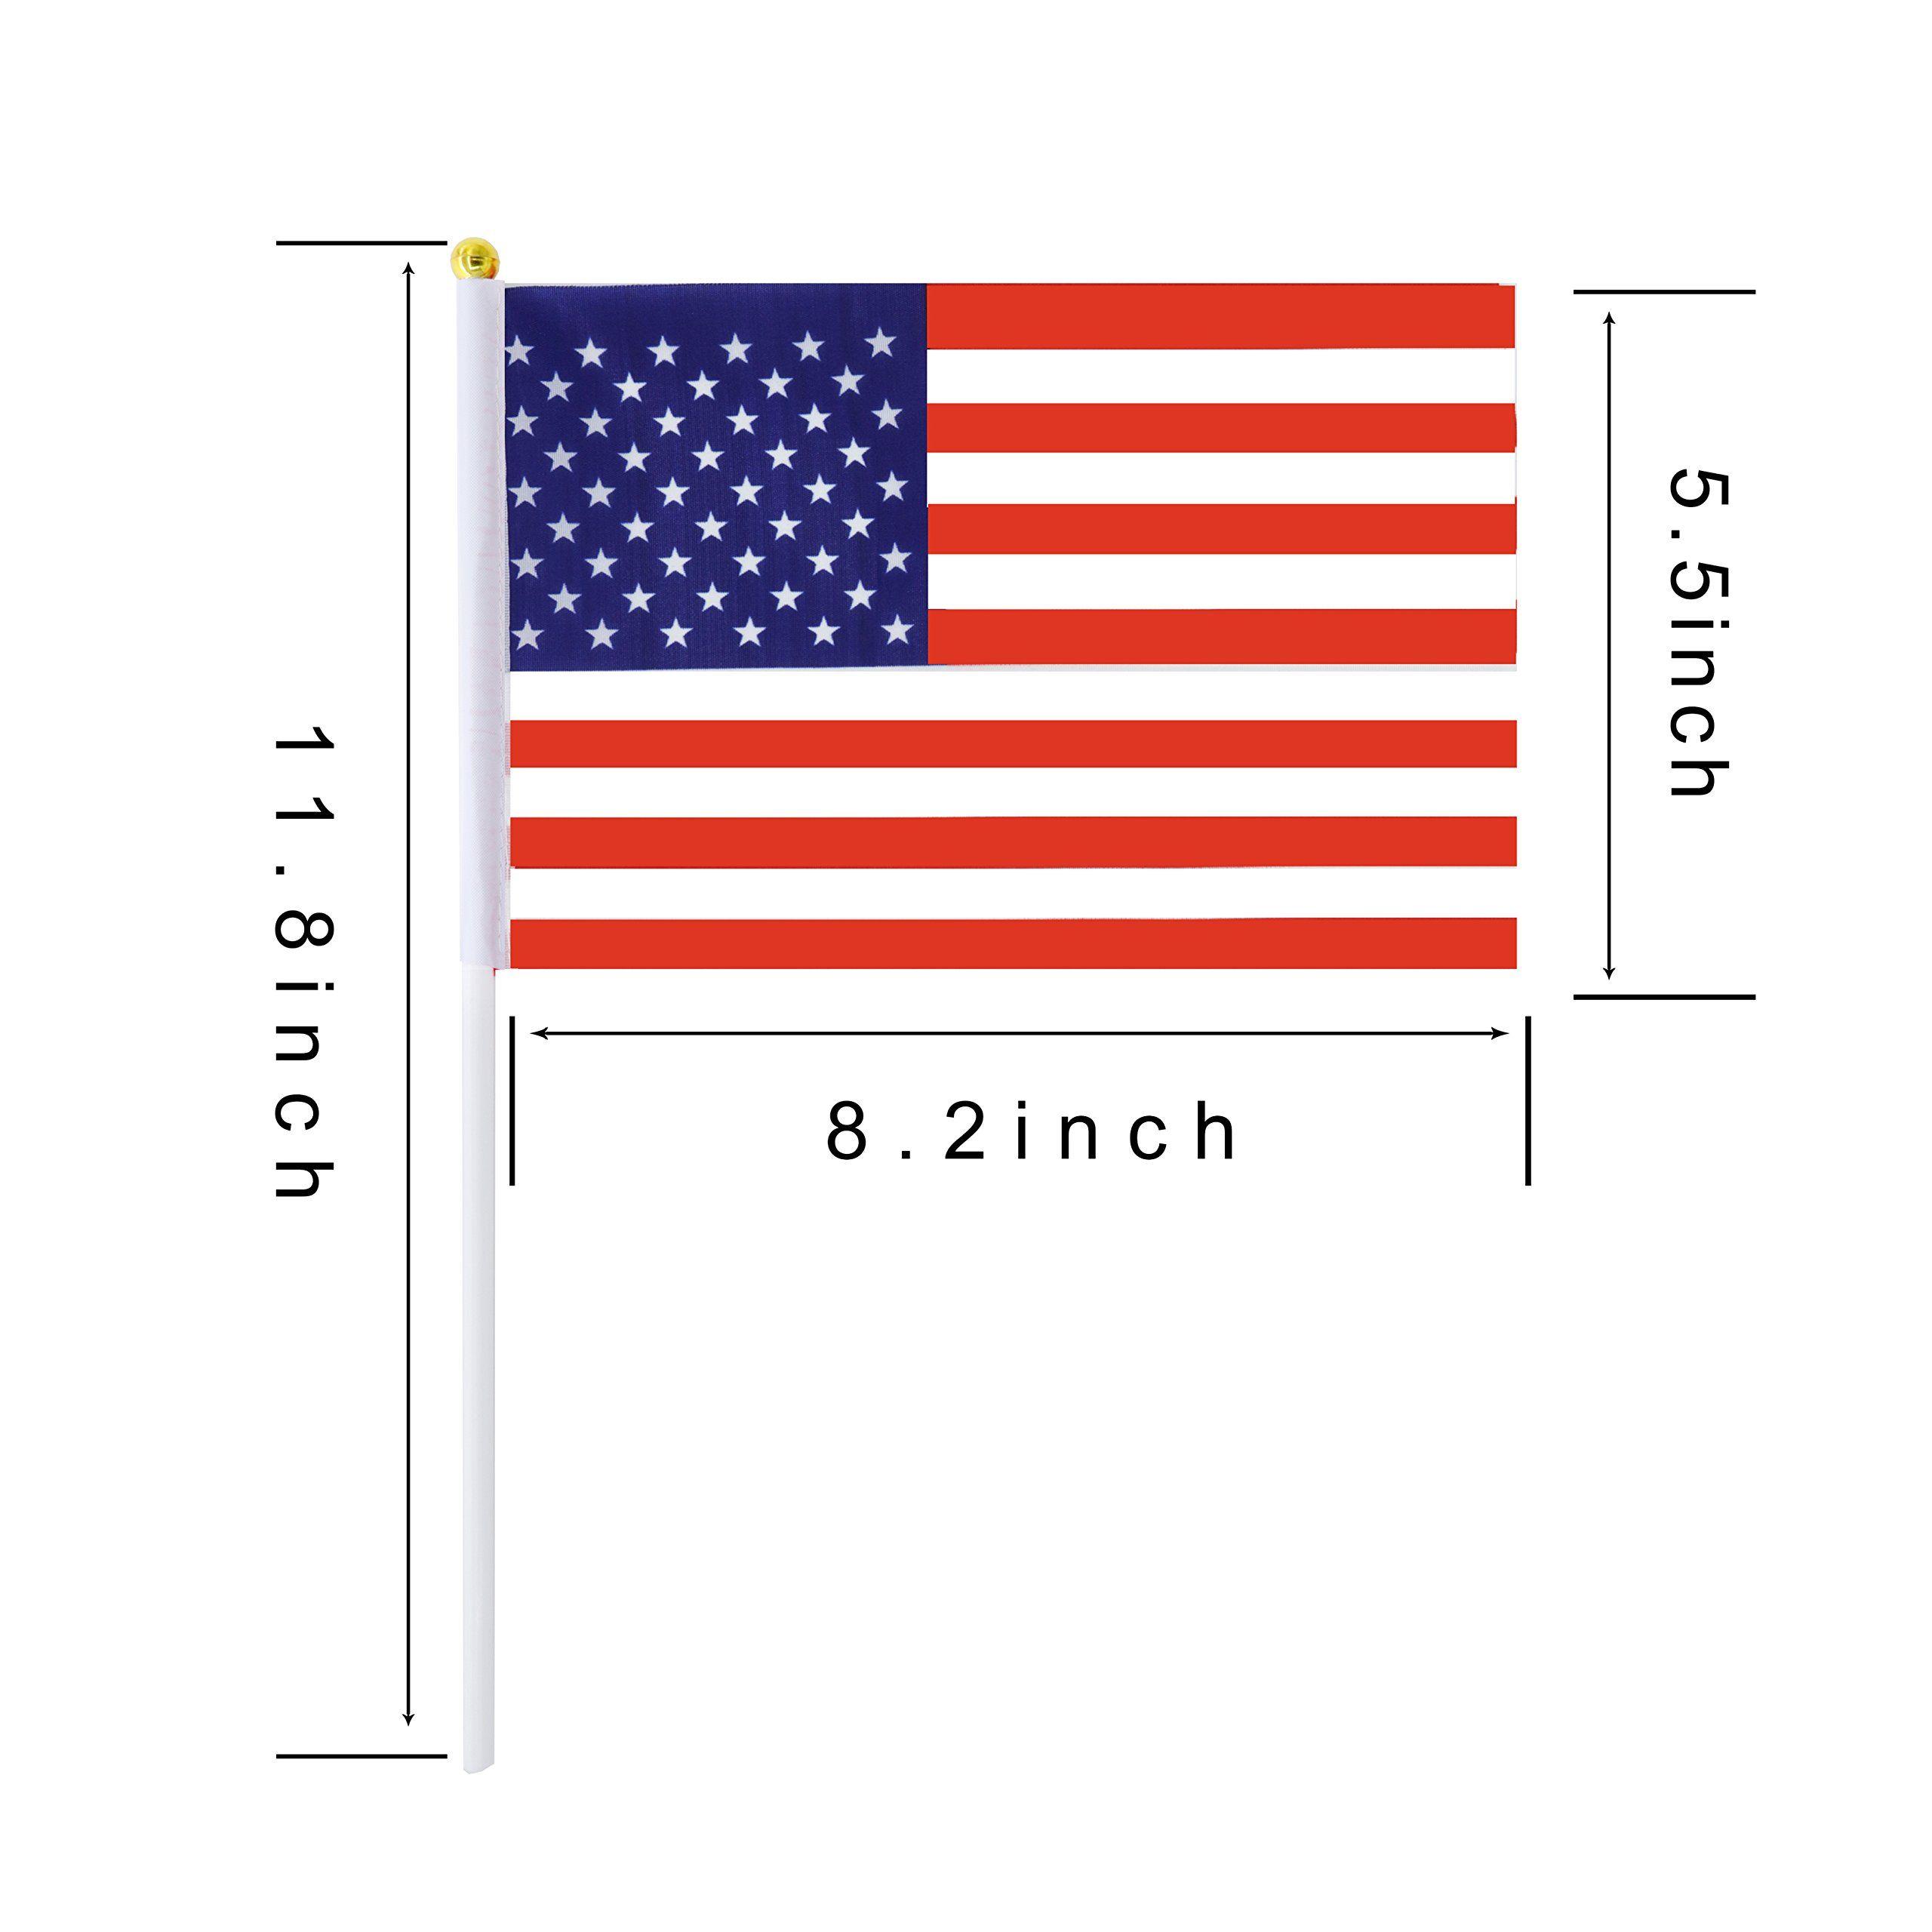 Consummate 50 Pack Usa American Stick Flag Small Mini Hand Held American Us Flags Plastic Pole Decorations Parades 4t American Flag Flag Flag Usa United States